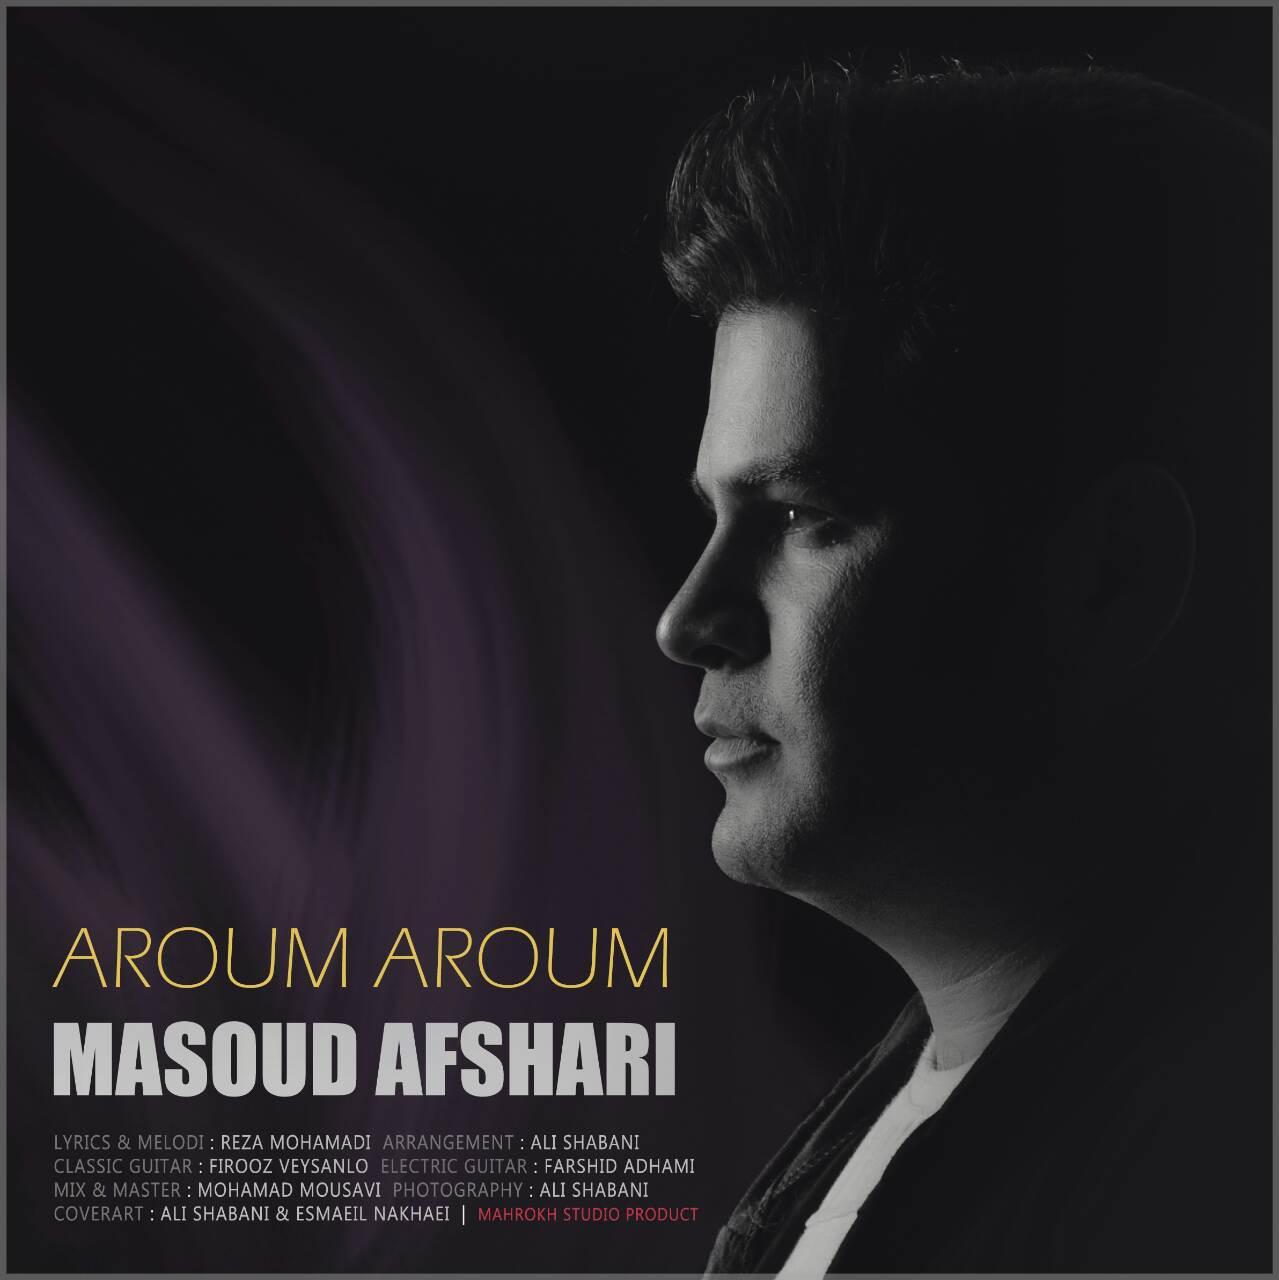 Masoud Afshari – Aroum Aroum